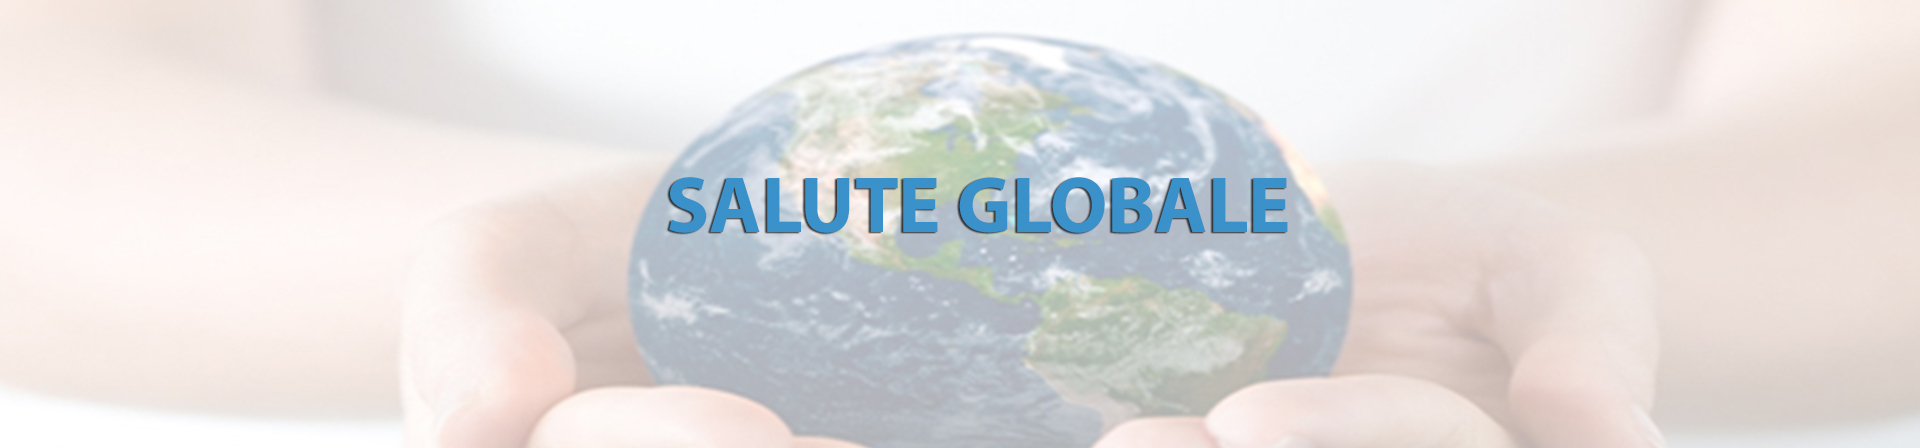 5-SALUTE GLOBALE